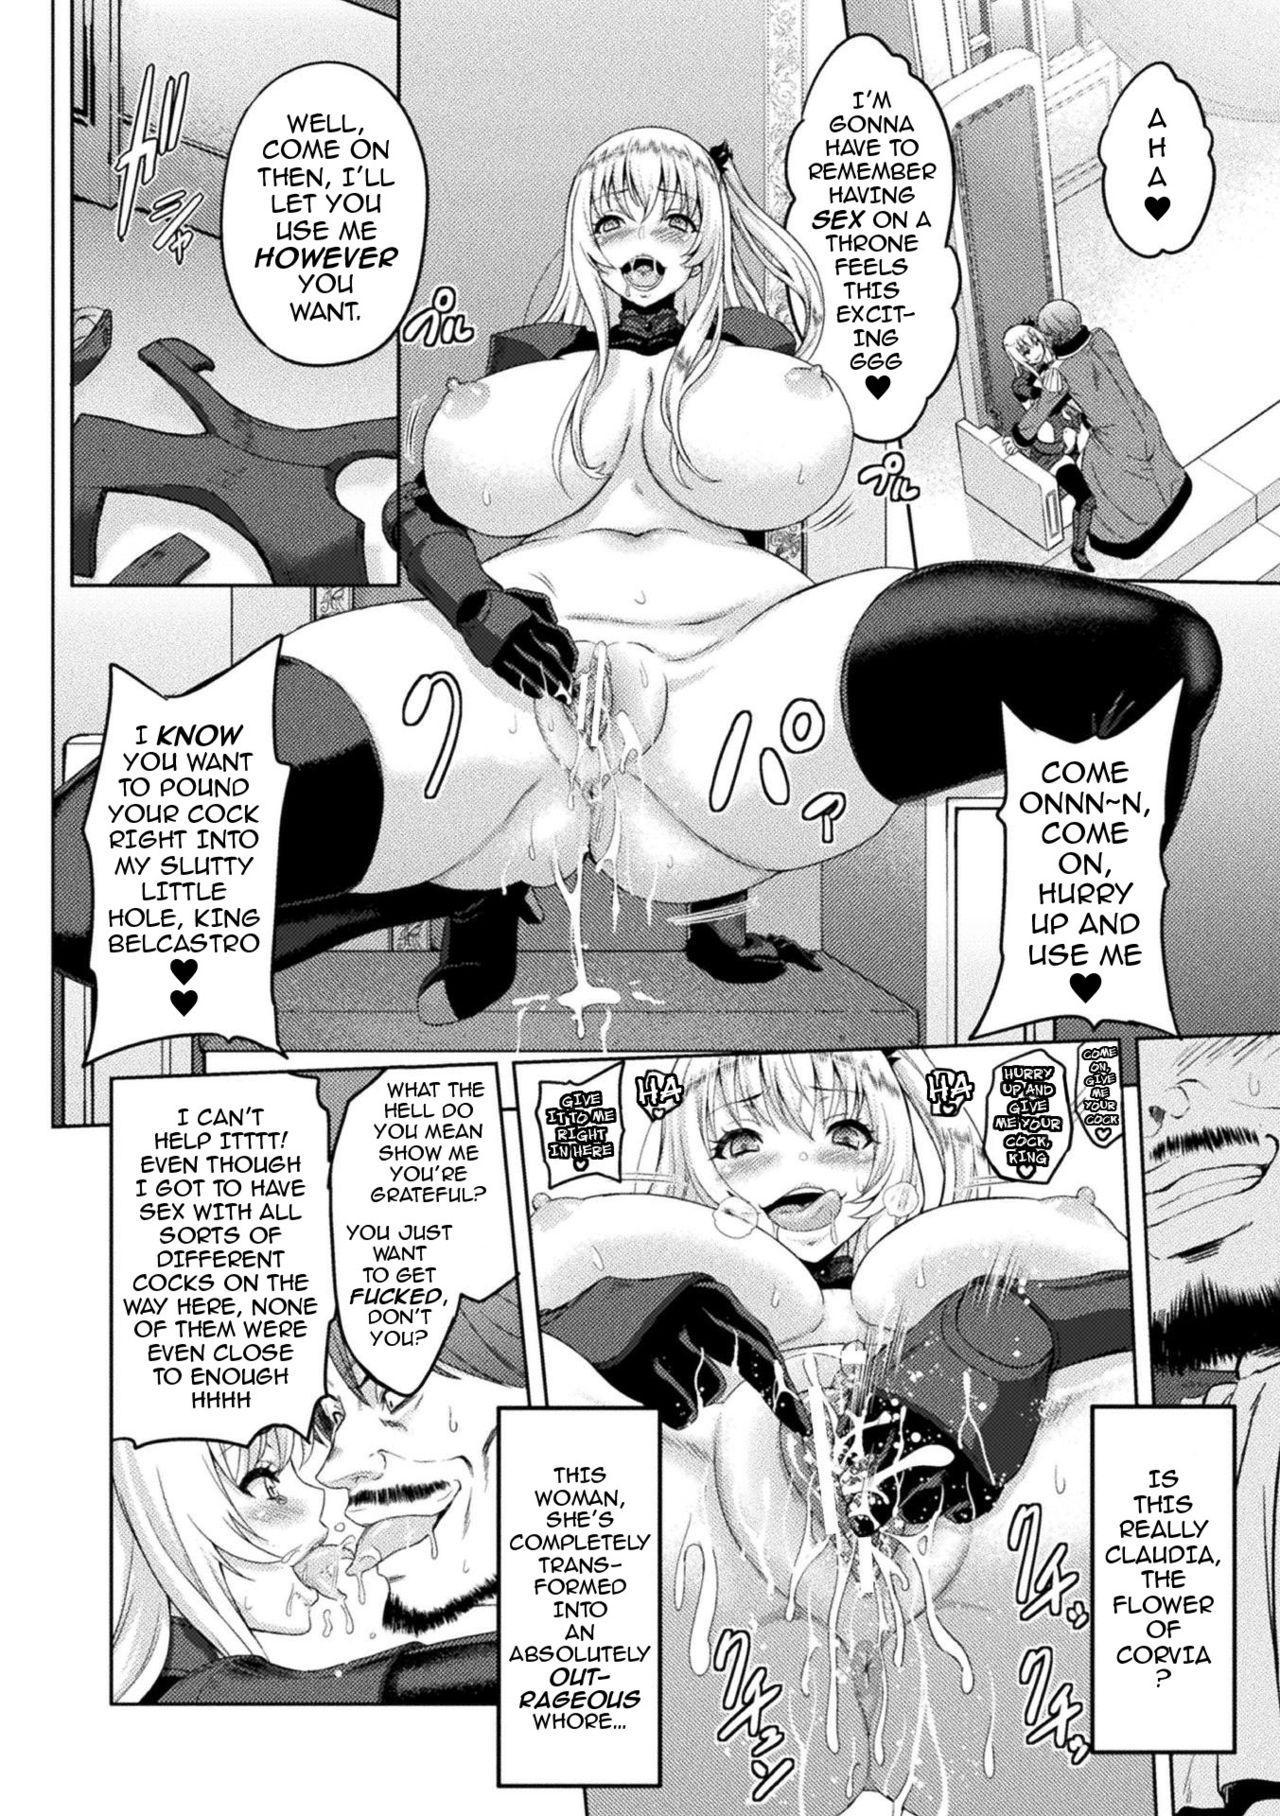 [Yamada Gogogo] Erona ~Orc no Inmon ni Okasareta Onna Kishi no Matsuro~   Erona ~The Fall of a Beautiful Knight Cursed with the Lewd Mark of an Orc~ Ch. 1-6 [English] {darknight} 82